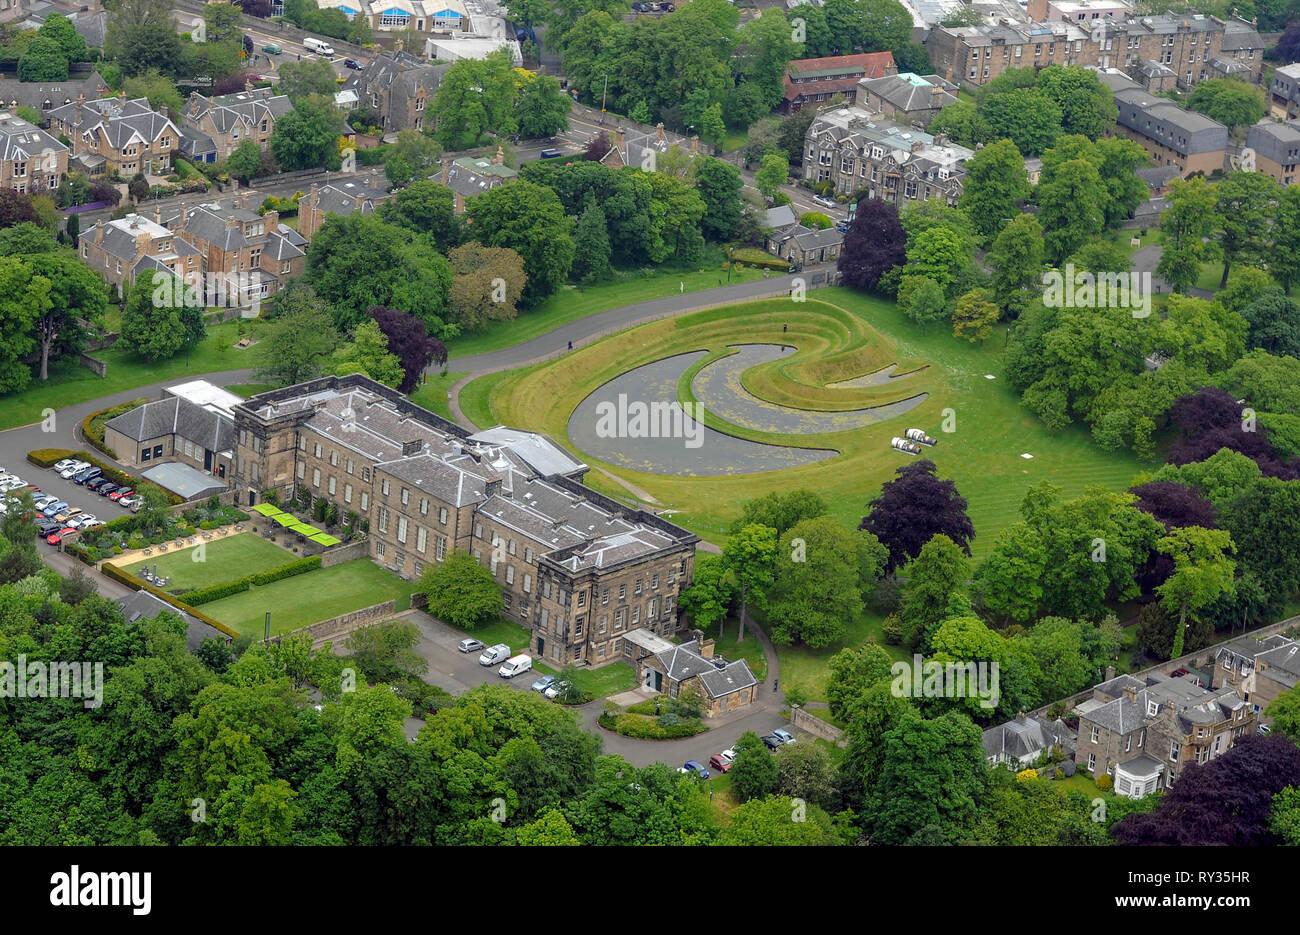 Aerial view of the Scottish Gallery of Modern Art, Belford Road, Edinburgh. Stock Photo